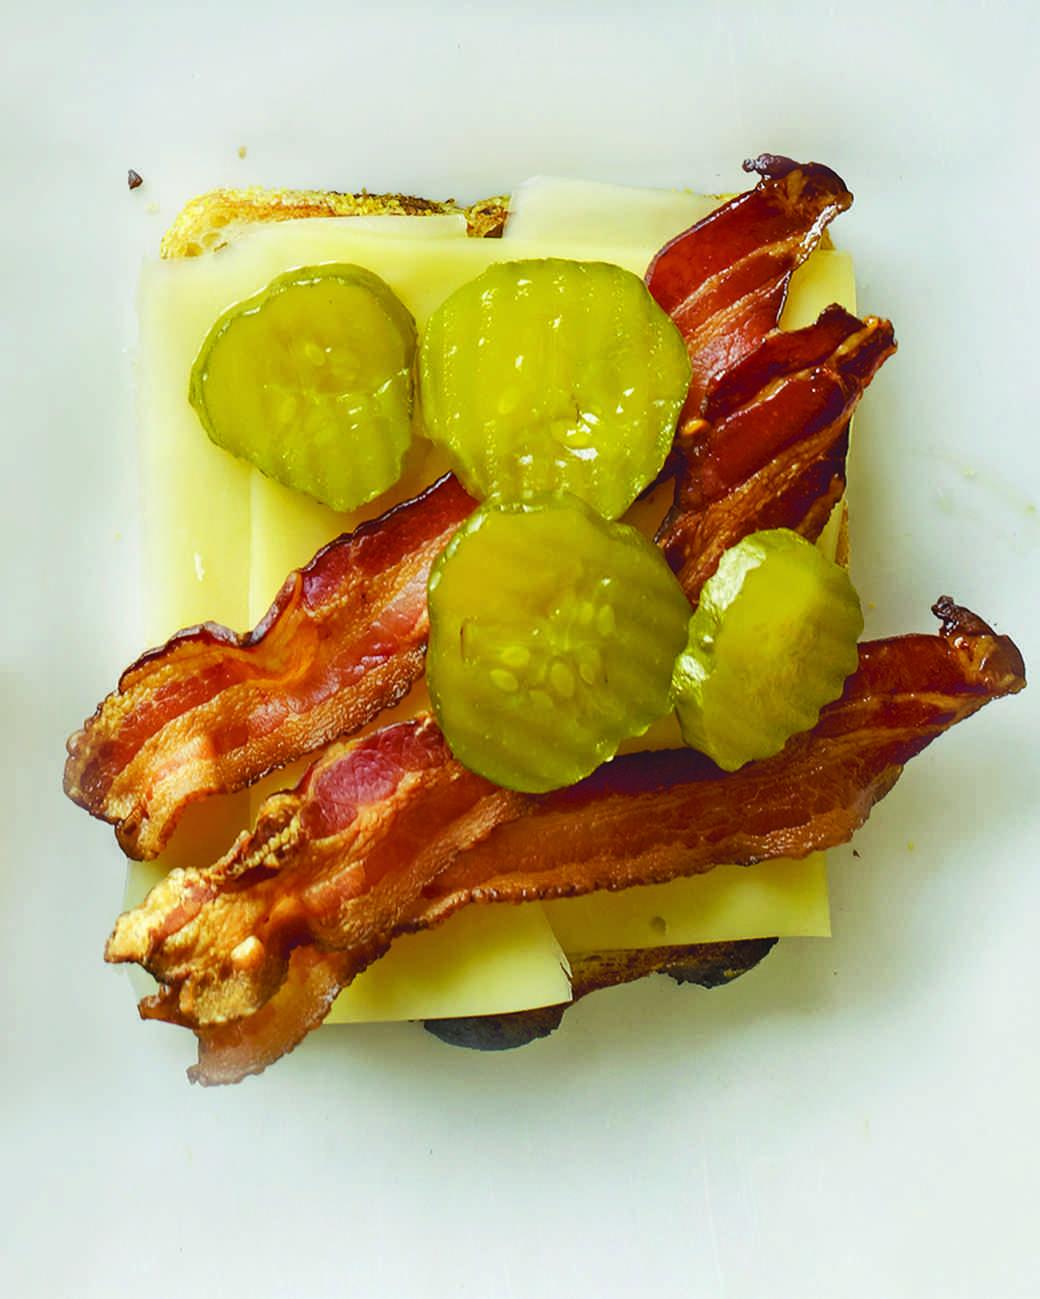 mld106119_1010_grill_chedder_pickles9.jpg